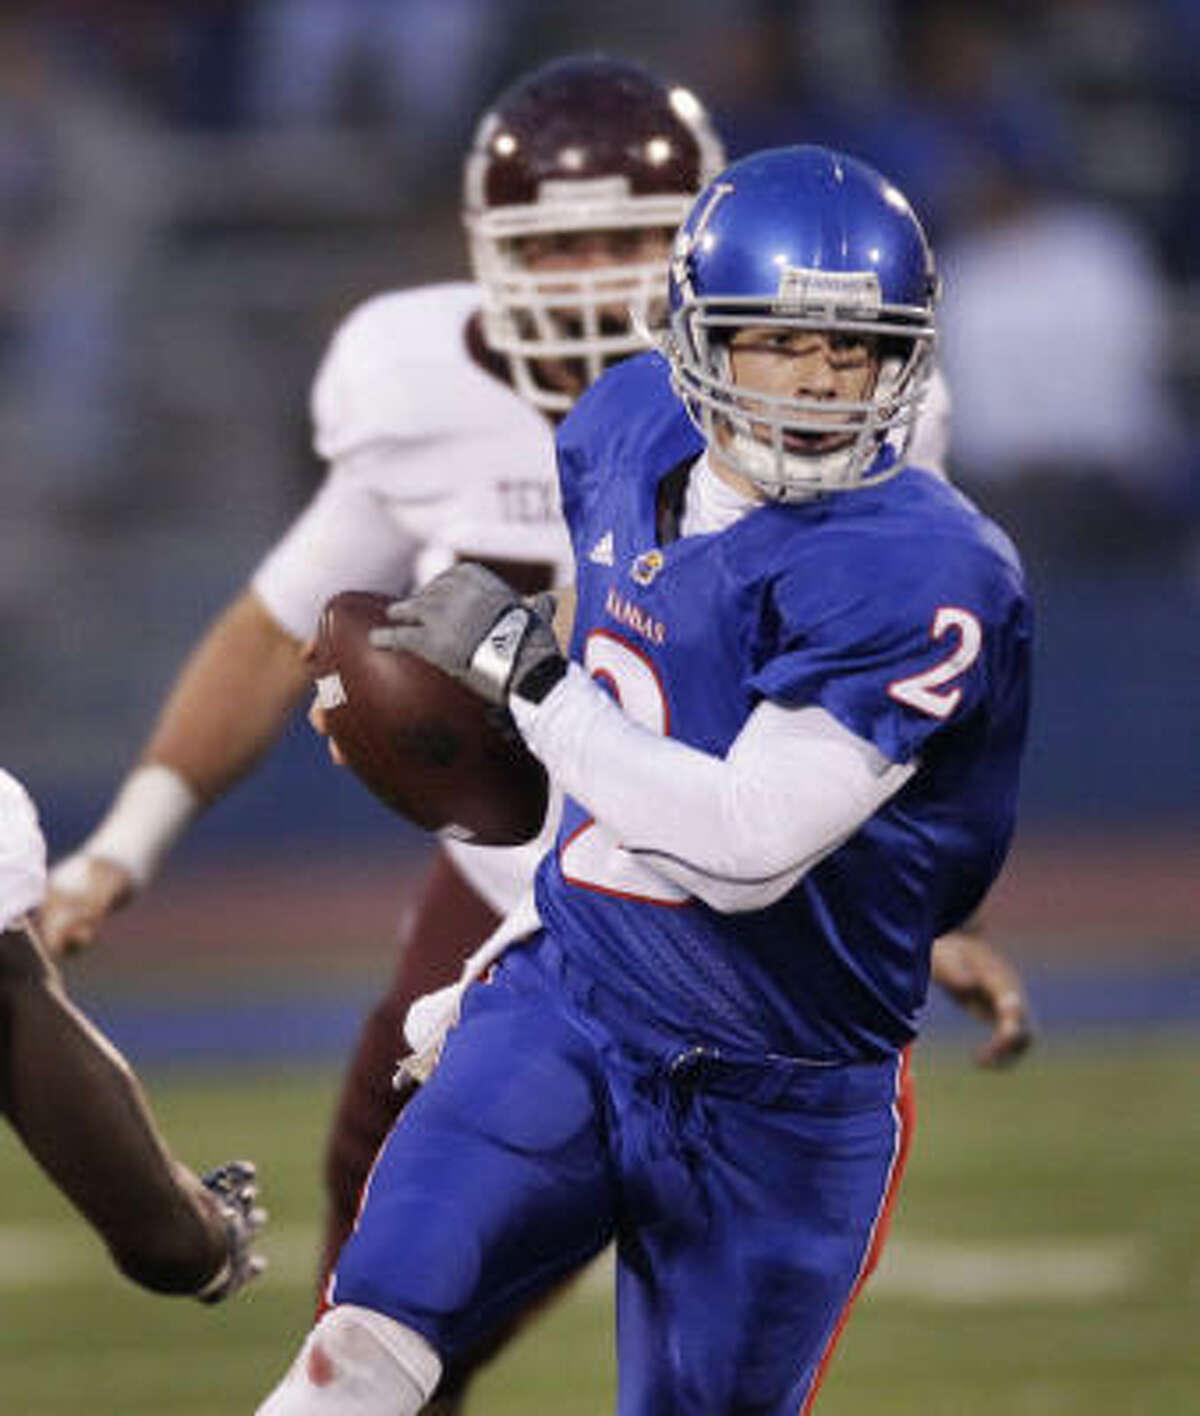 Kansas quarterback Jordan Webb runs away from Texas A&M defensive tackle Lucas Patterson for a 25-yard gain during the first half.